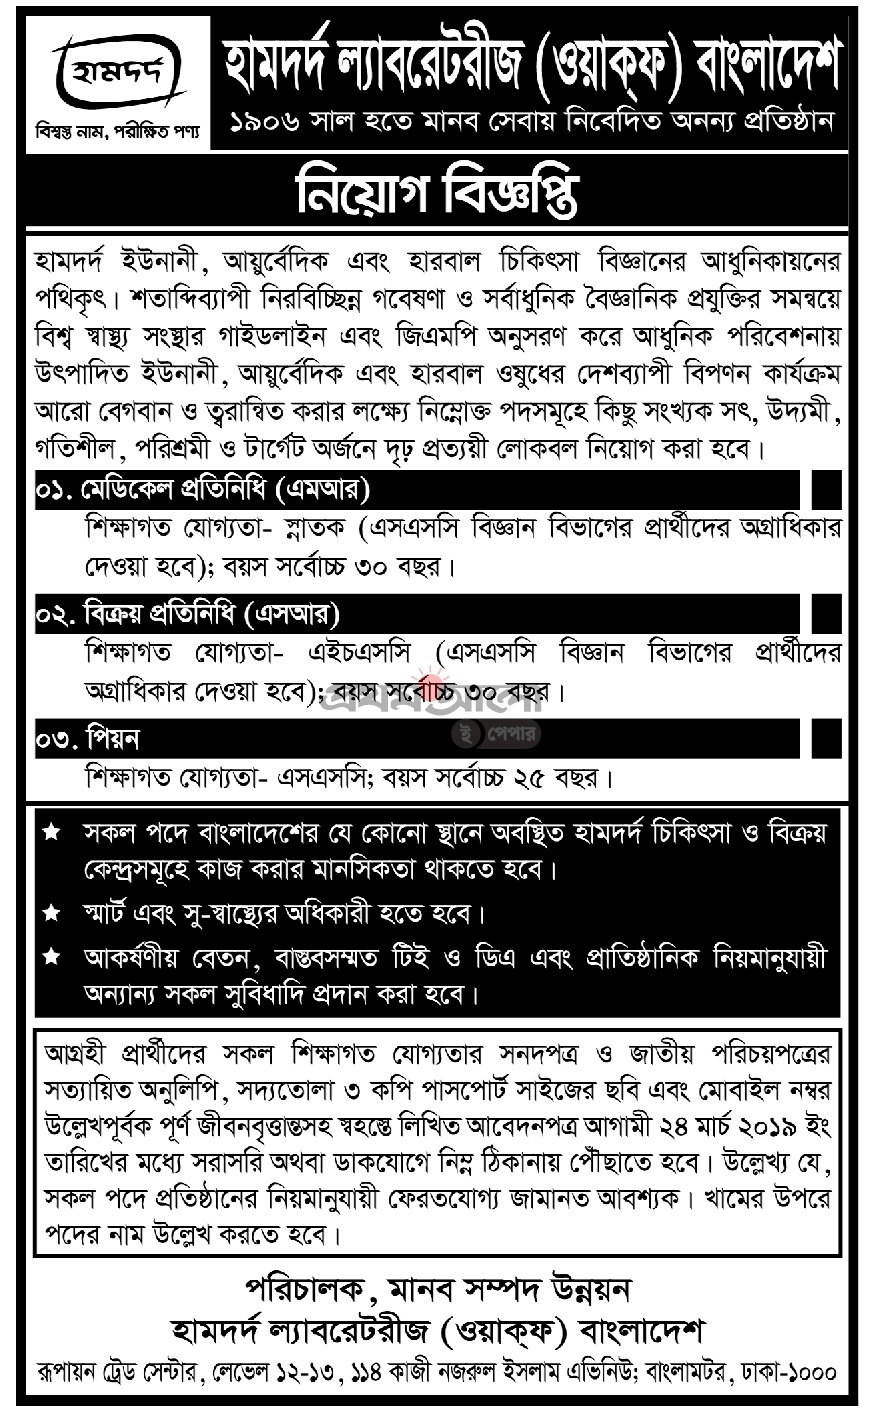 Hamdard Laboratories (WAQF) Bangladesh Job Circular 2019